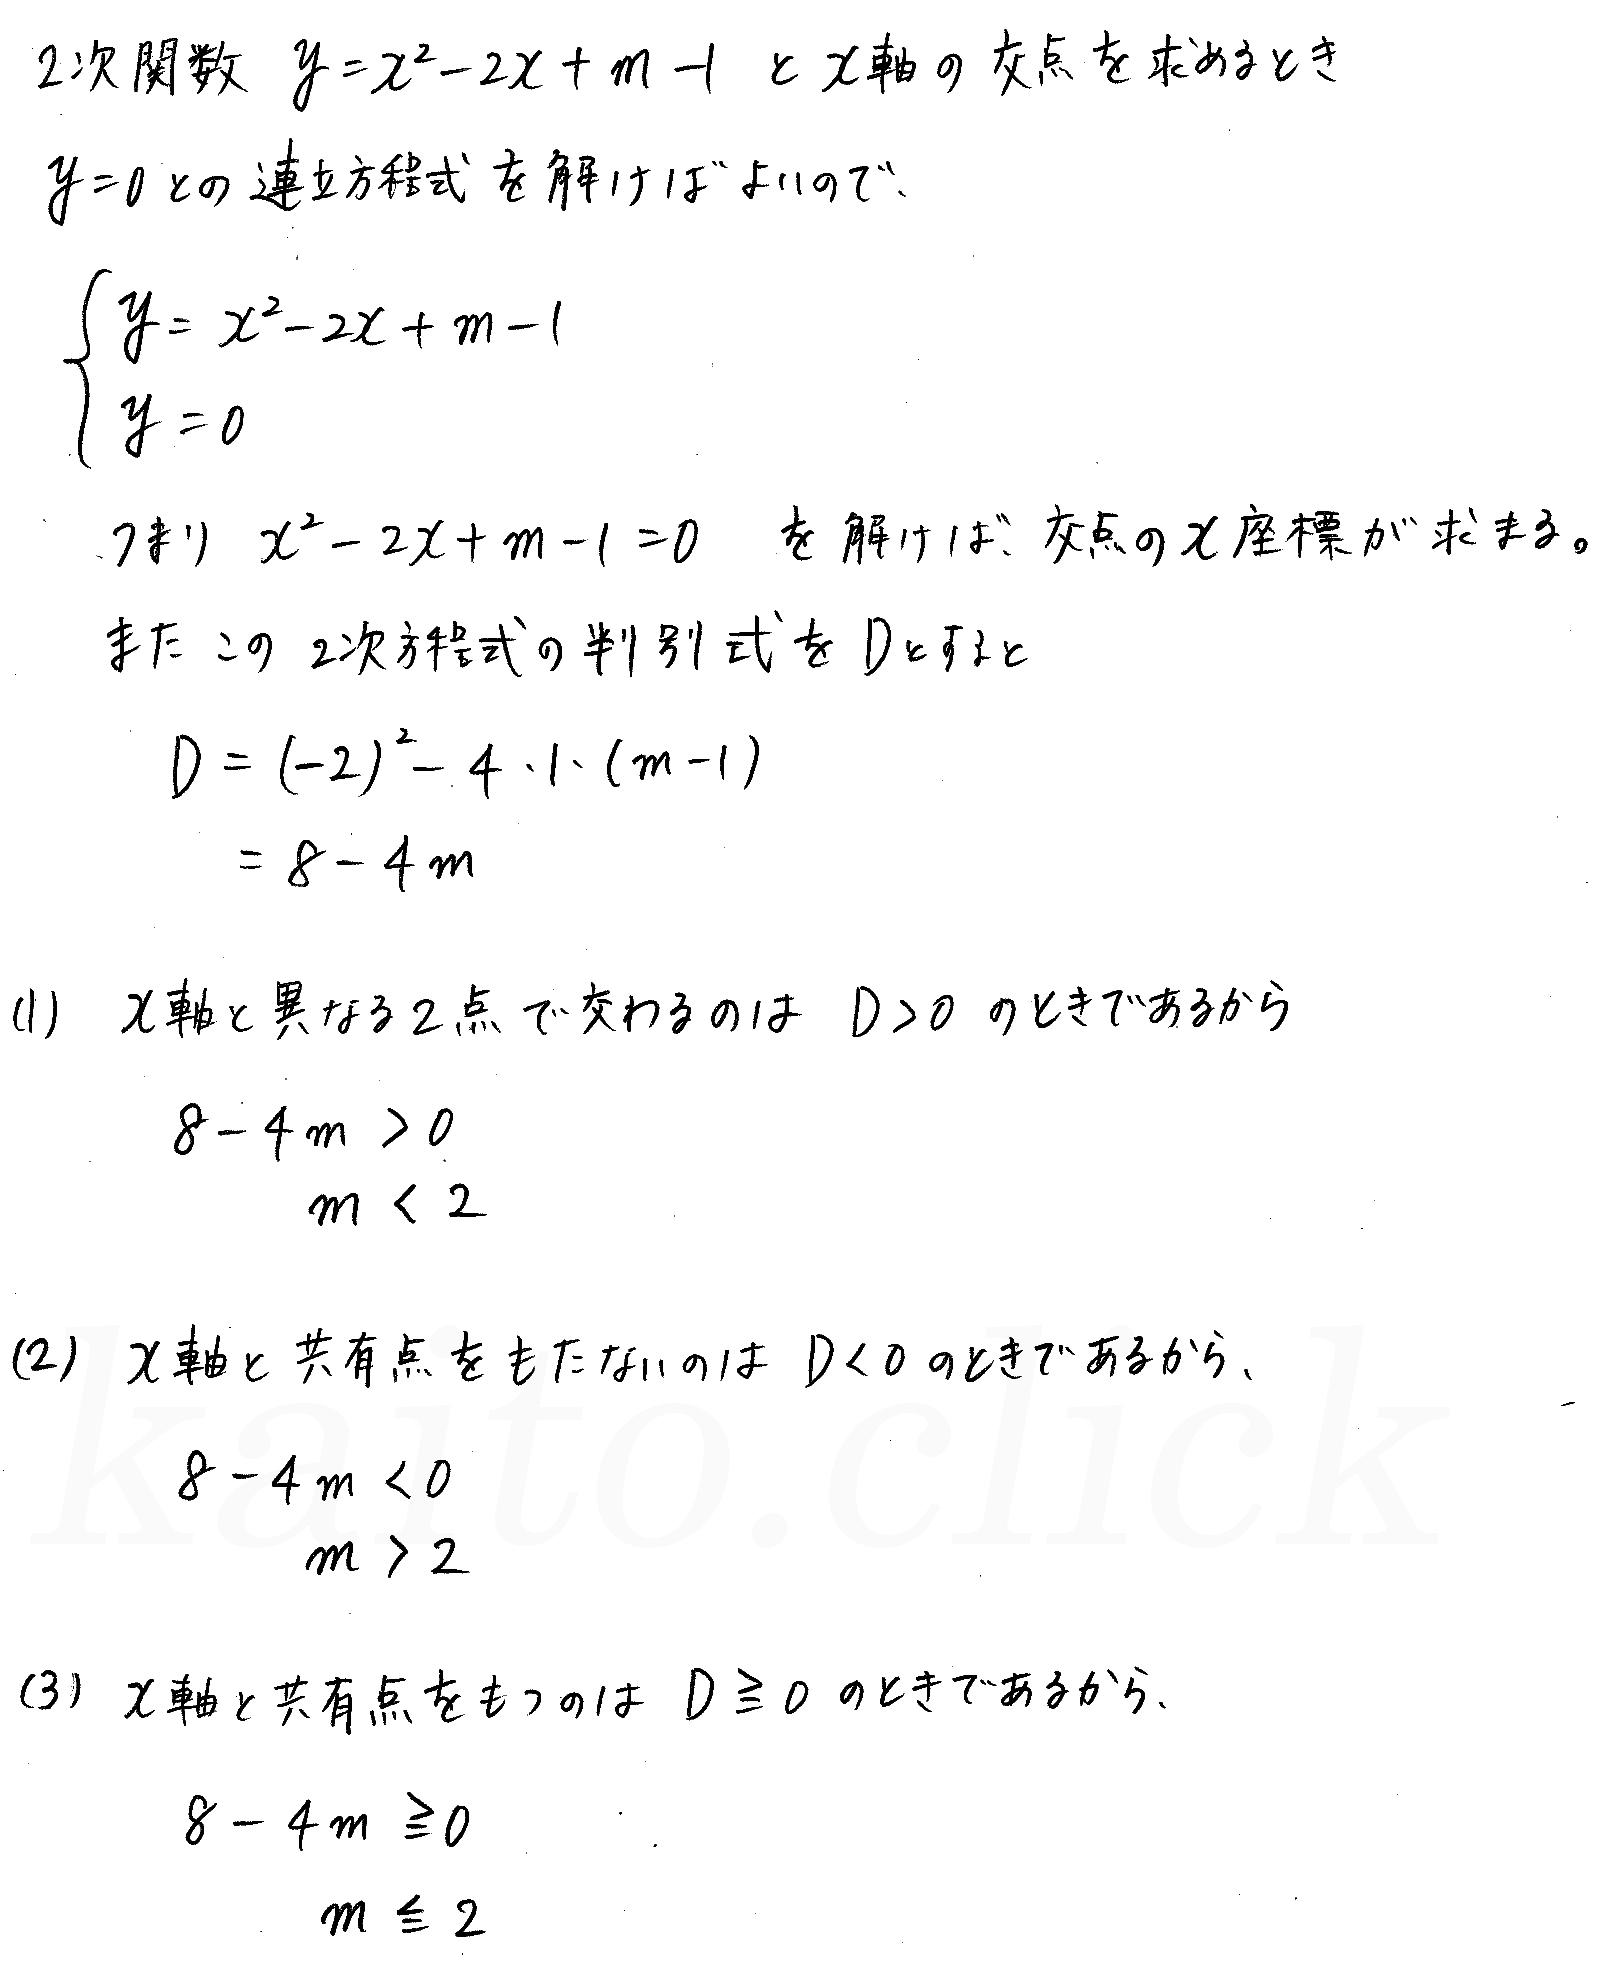 3TRIAL数学Ⅰ-173解答